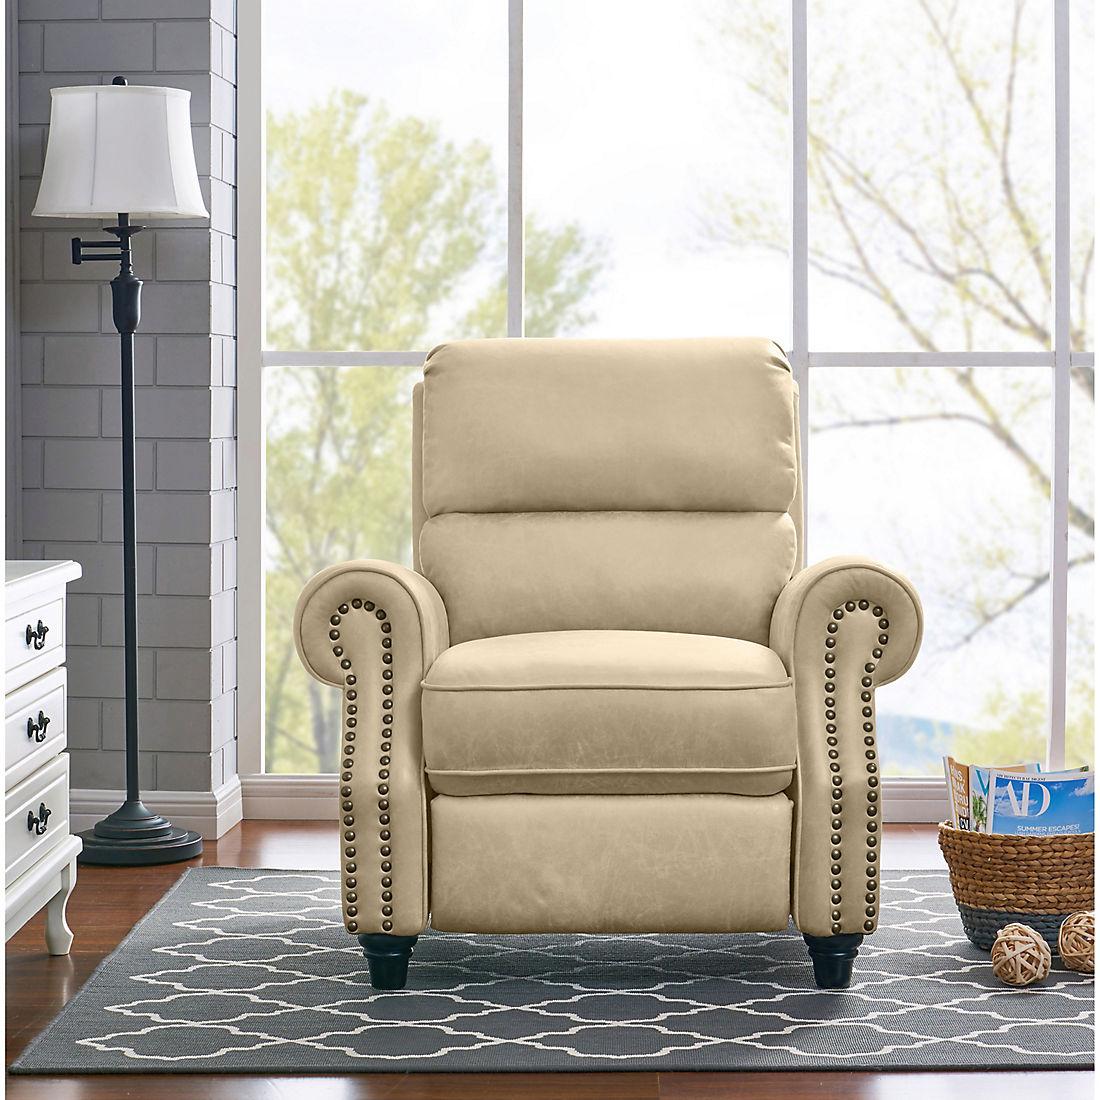 Sensational Prolounger Faux Leather Push Back Recliner Latte Tan Ibusinesslaw Wood Chair Design Ideas Ibusinesslaworg